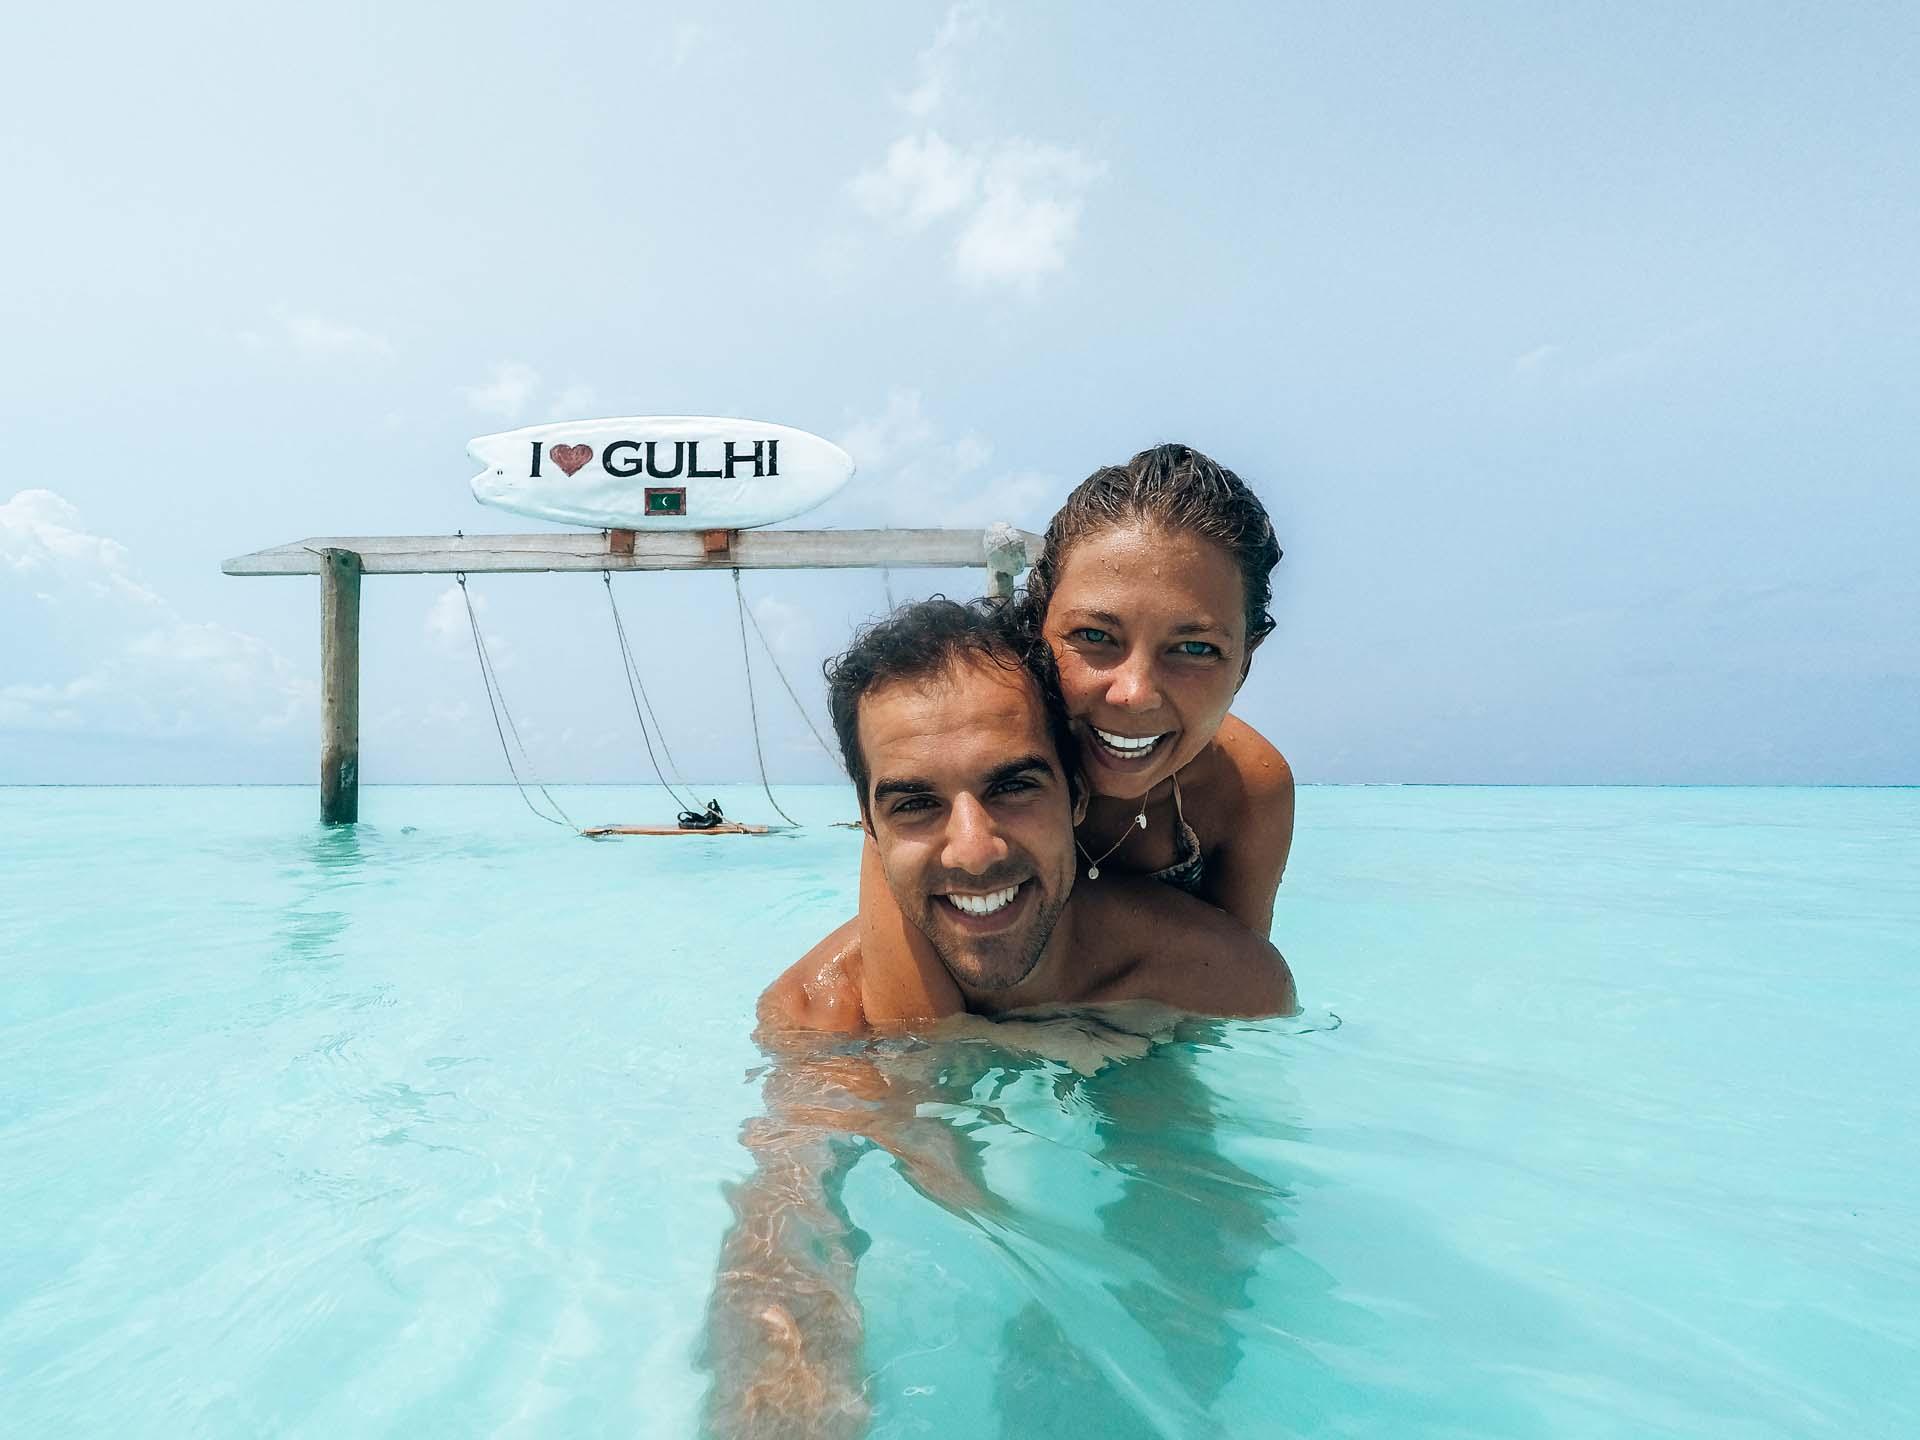 Having fun at Gulhi island